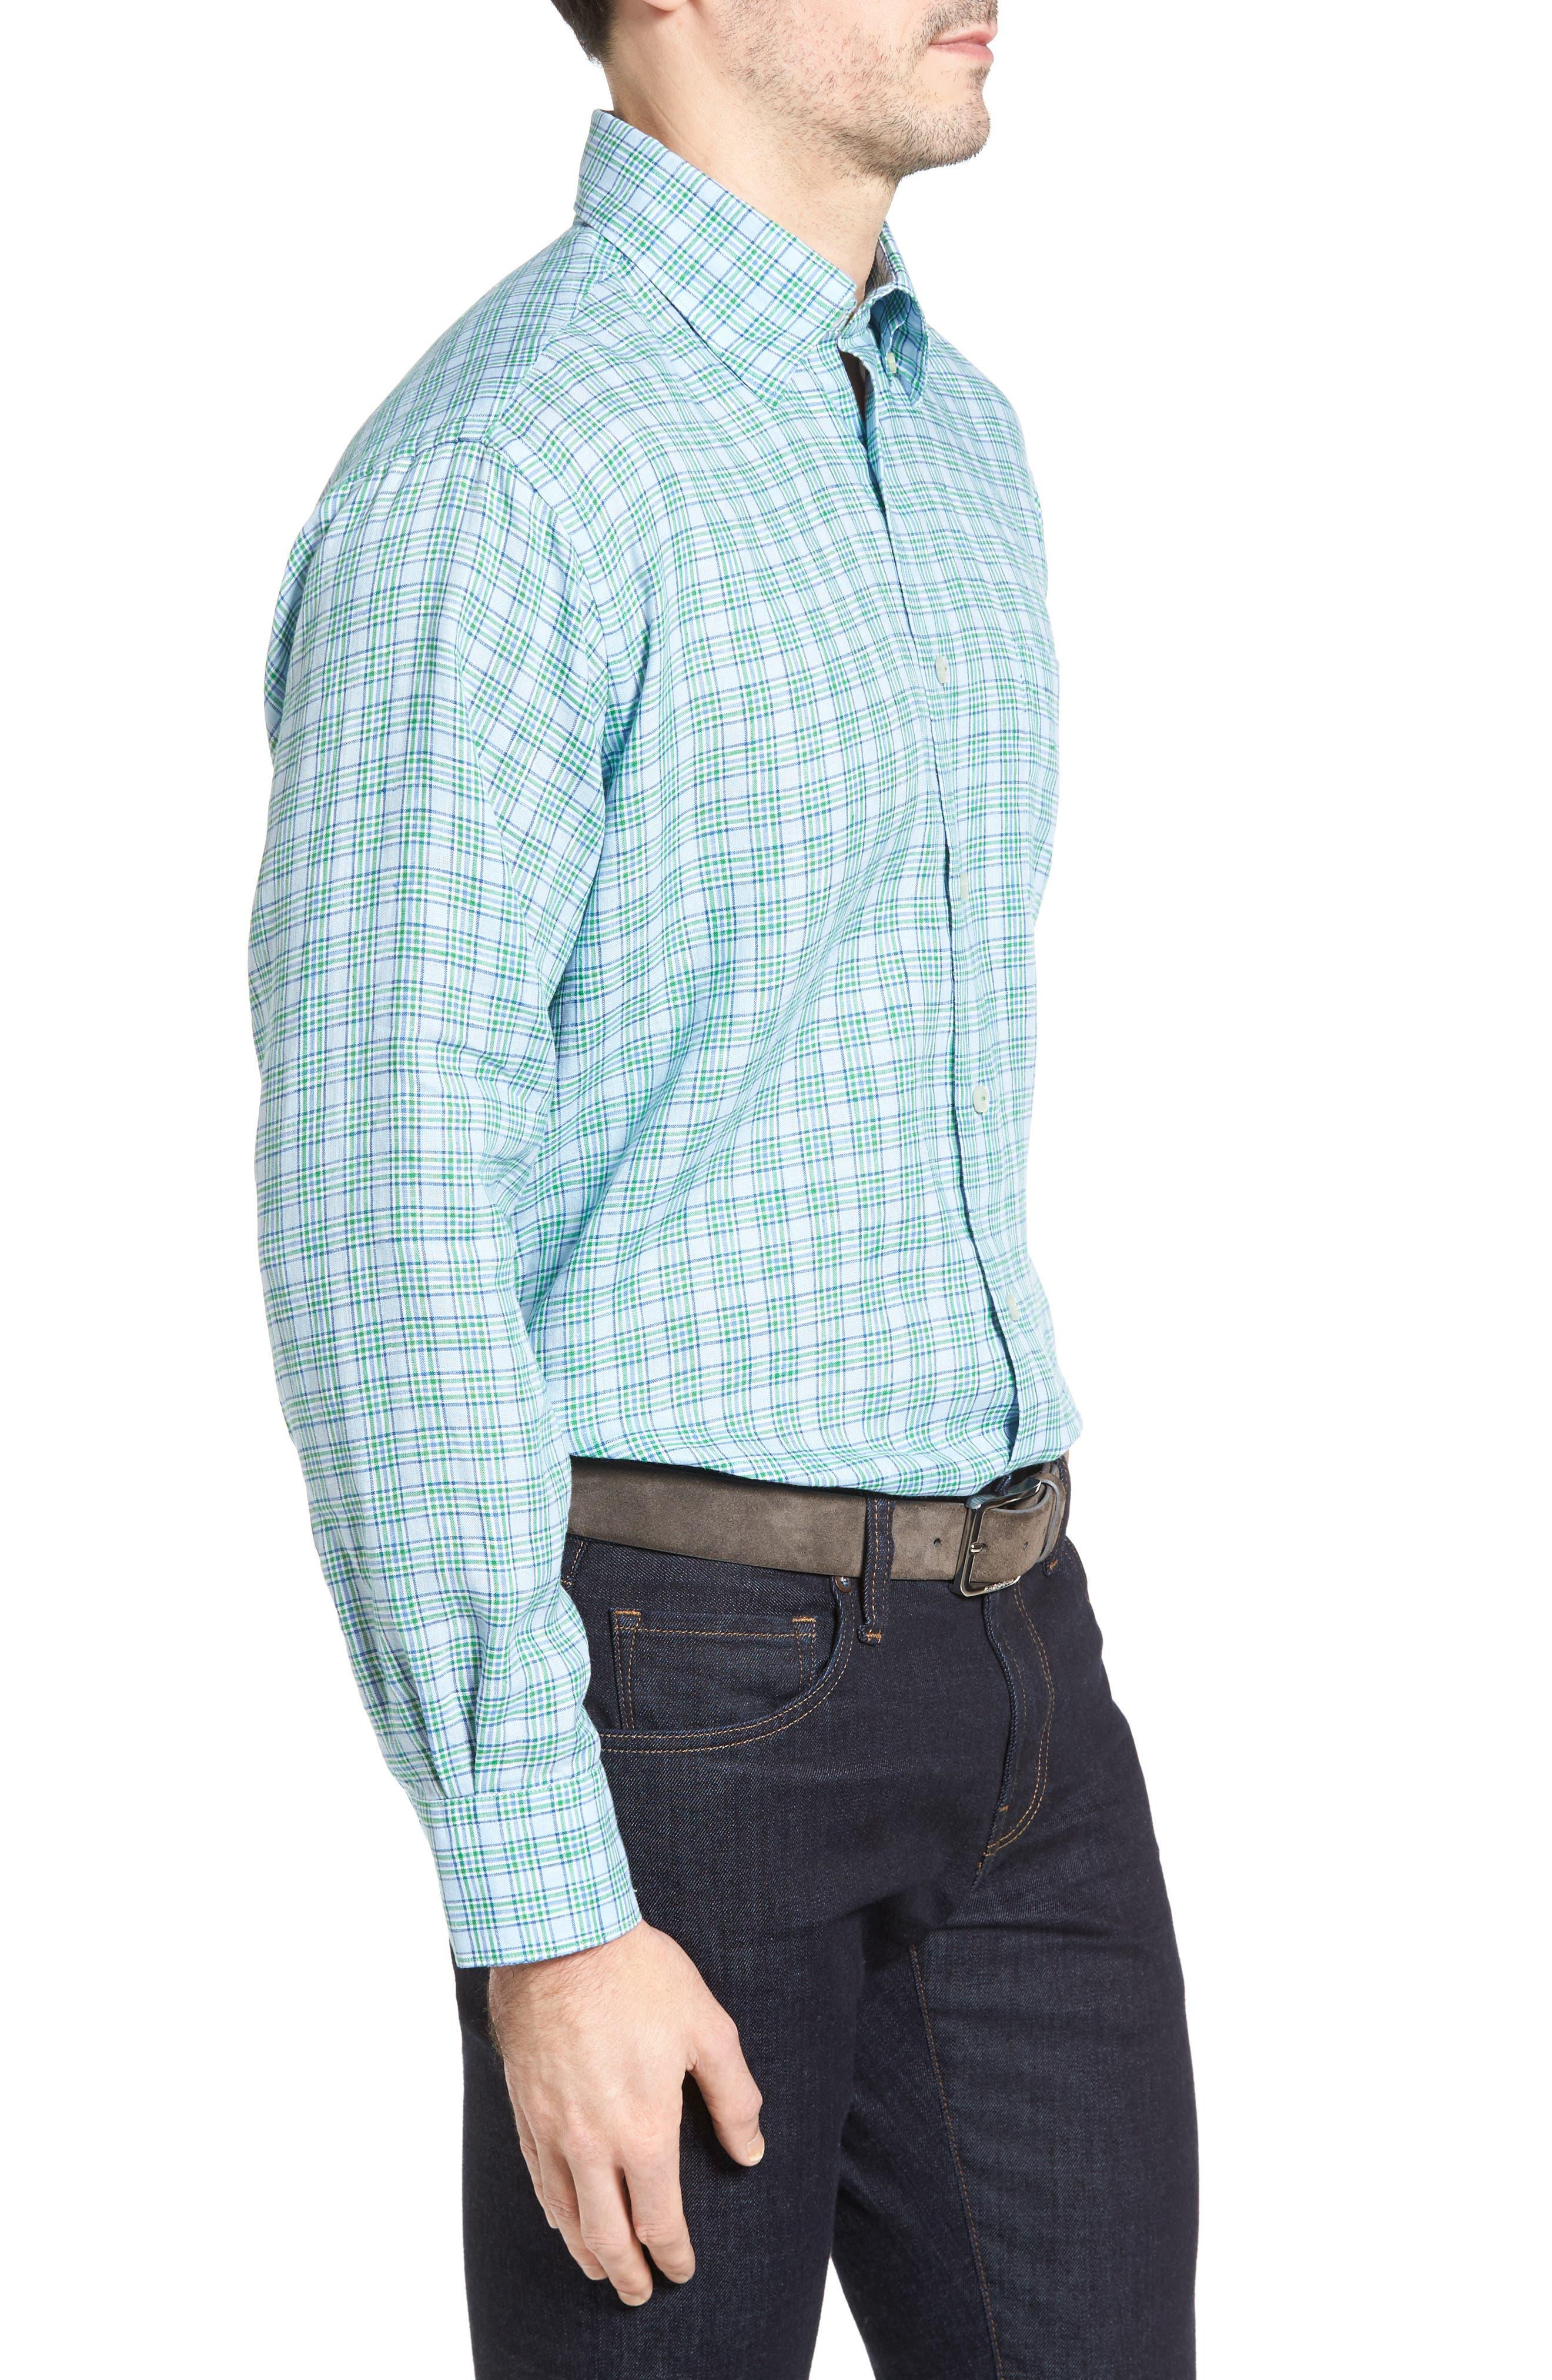 Anderson Classic Fit Sport Shirt,                             Alternate thumbnail 3, color,                             449